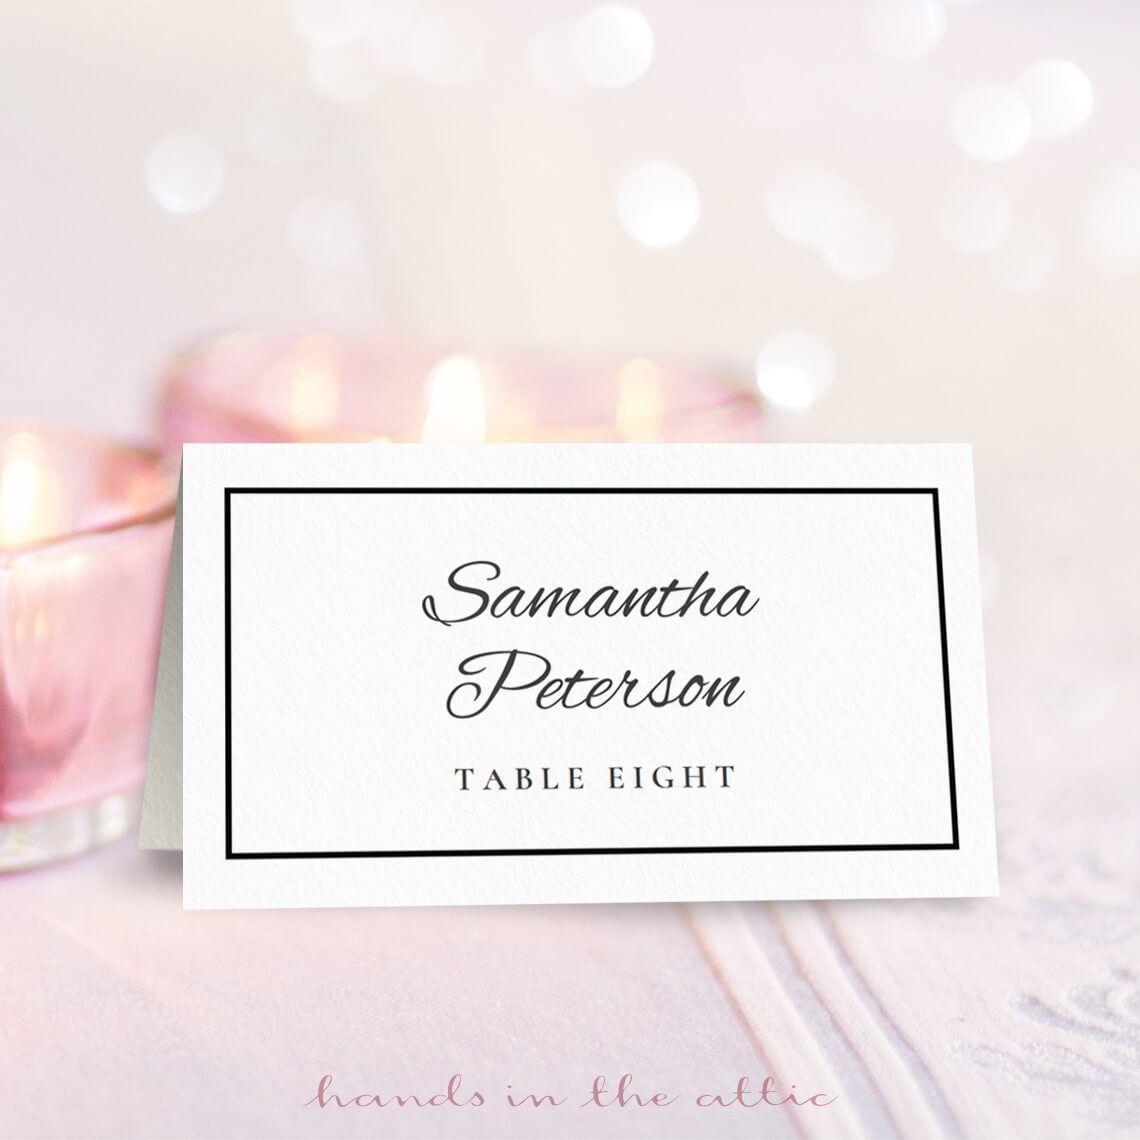 009 Phenomenal Wedding Name Card Template High Resolution  Free Download Design Sticker FormatFull